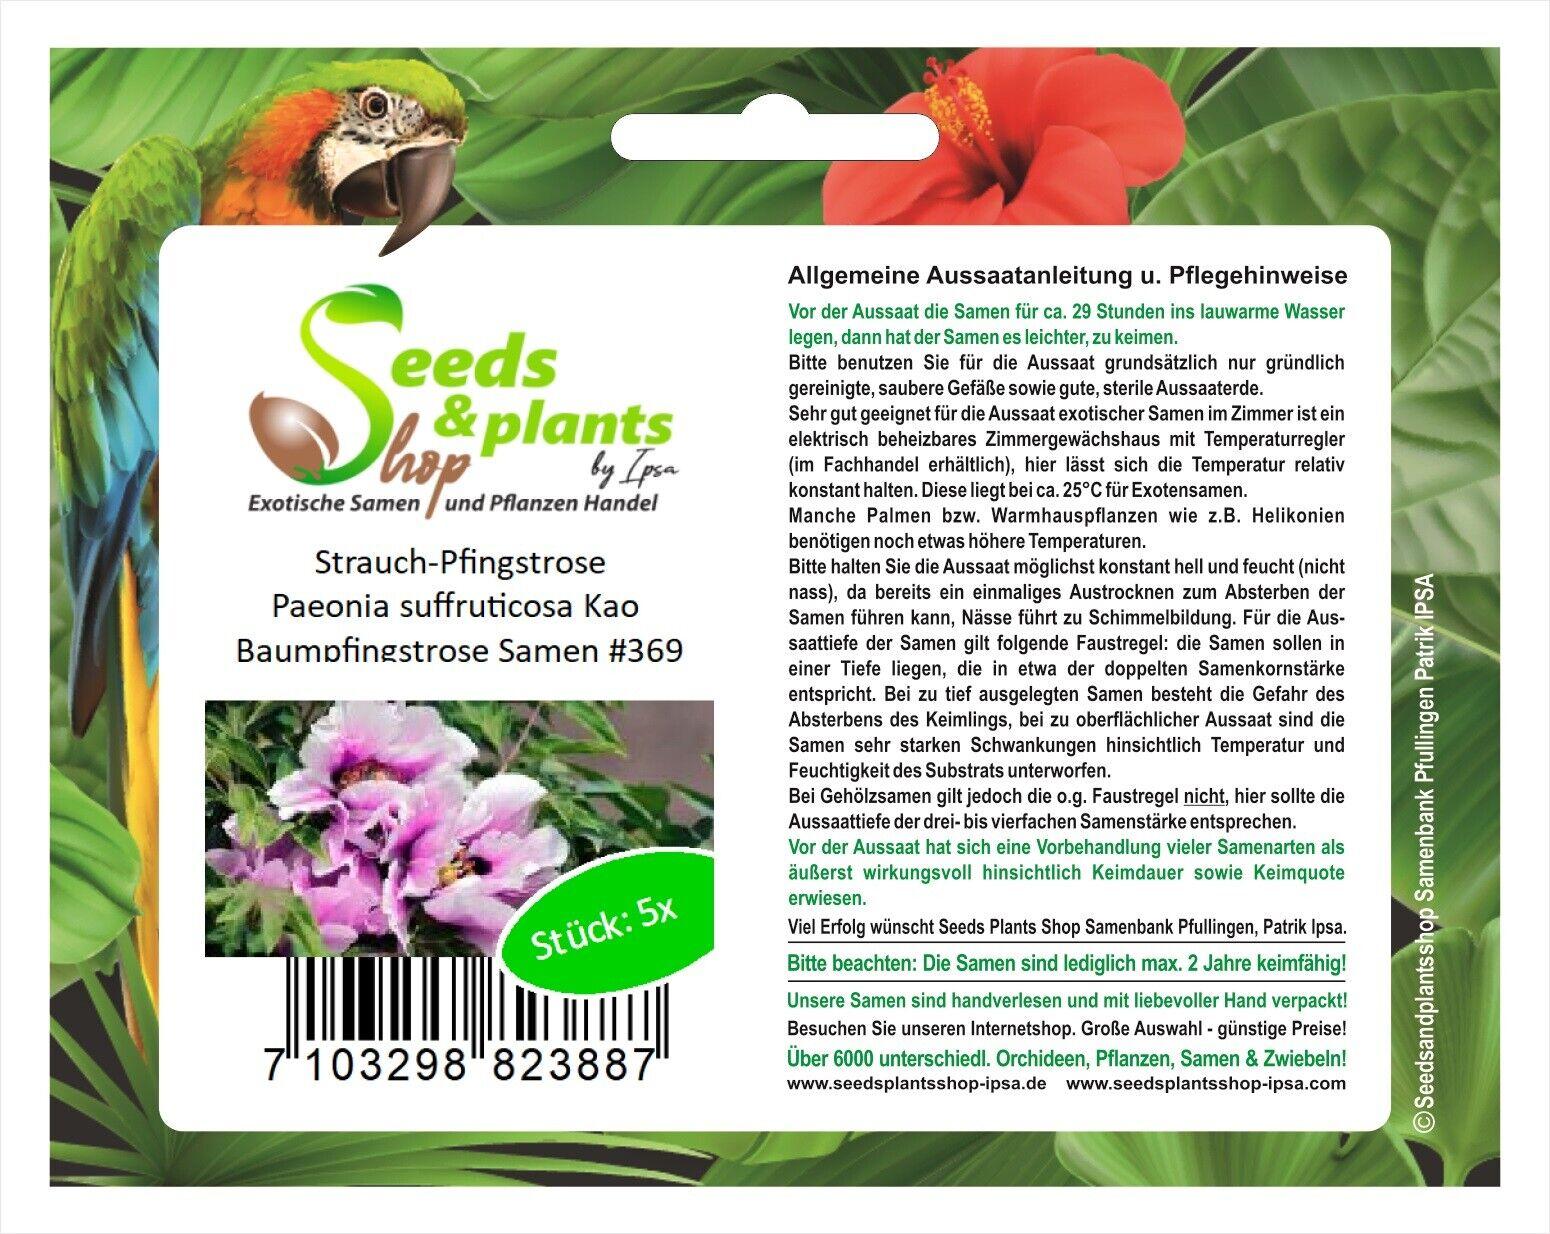 5x Pfingstrose Paeonia suffruticosa Kao Baumpfingstrose Samen #369